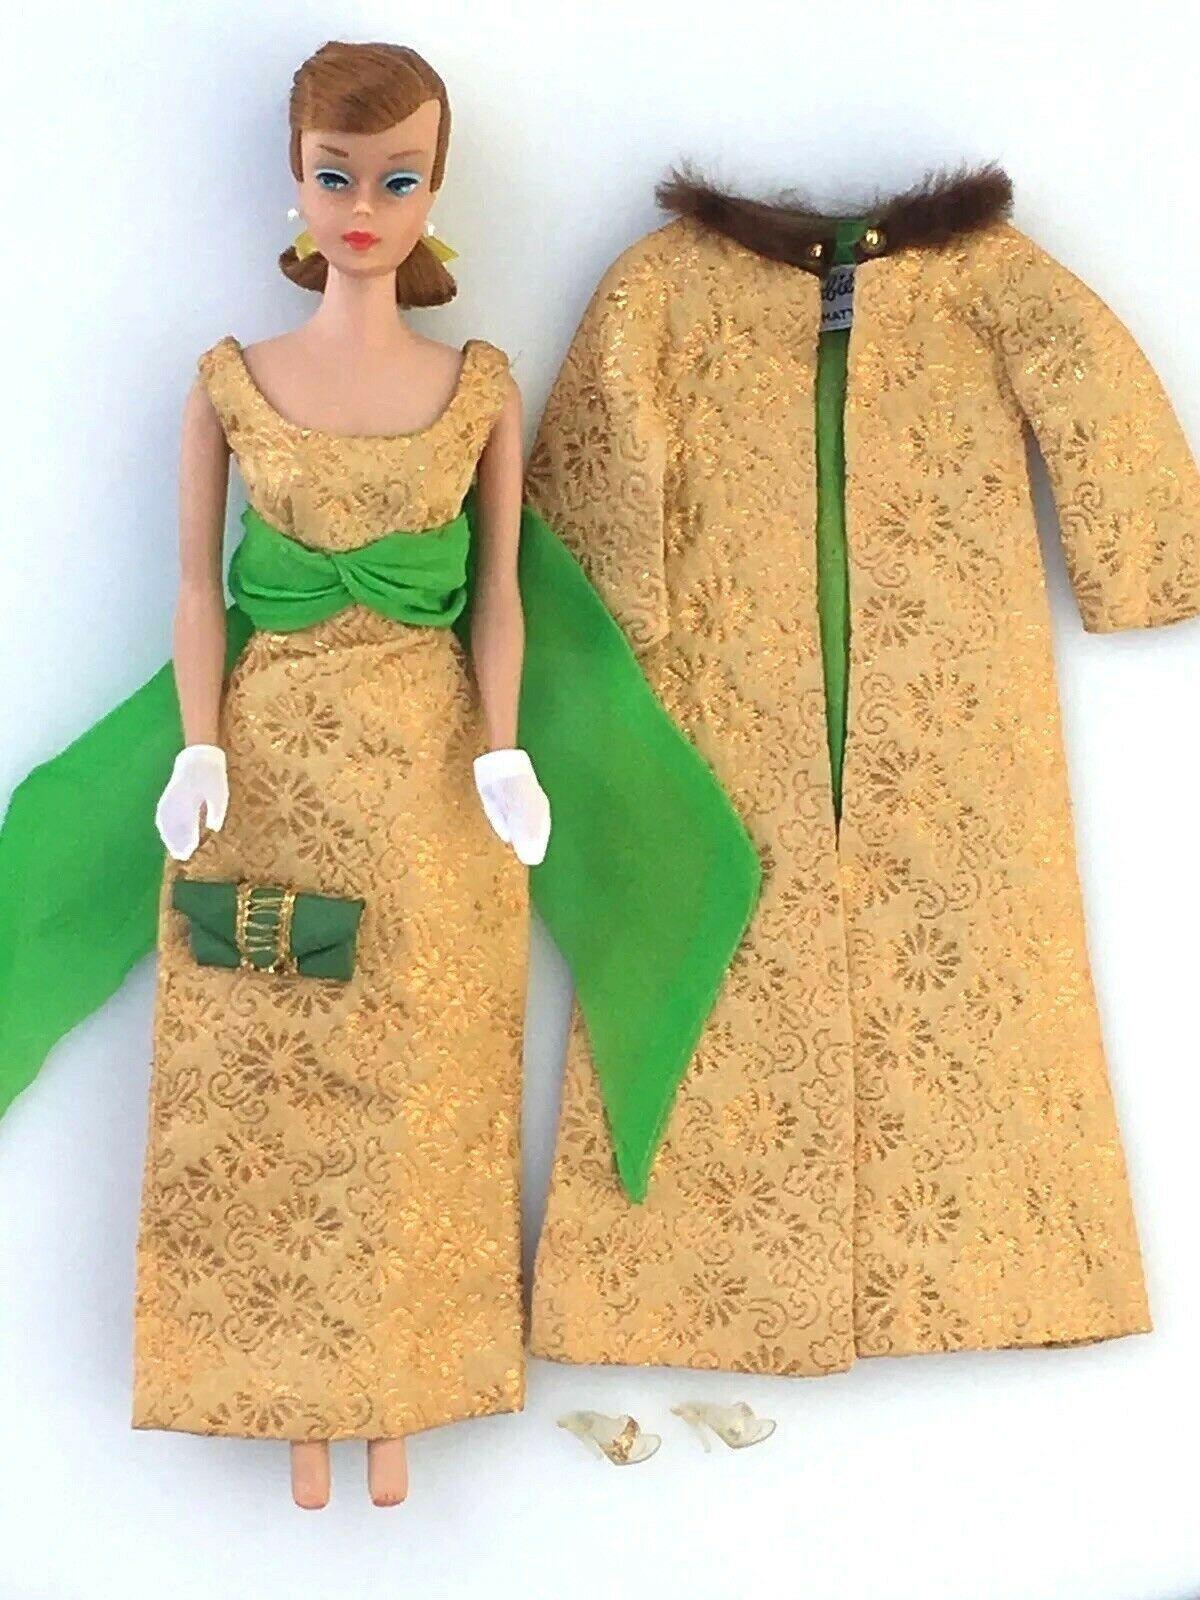 1960s Barbie Clothes Golden Glory By Mattel 1645 Complete No Doll Ebay Barbieclothes Barbiefashion B Barbie Clothes Barbie Fashion Vintage Barbie Dolls